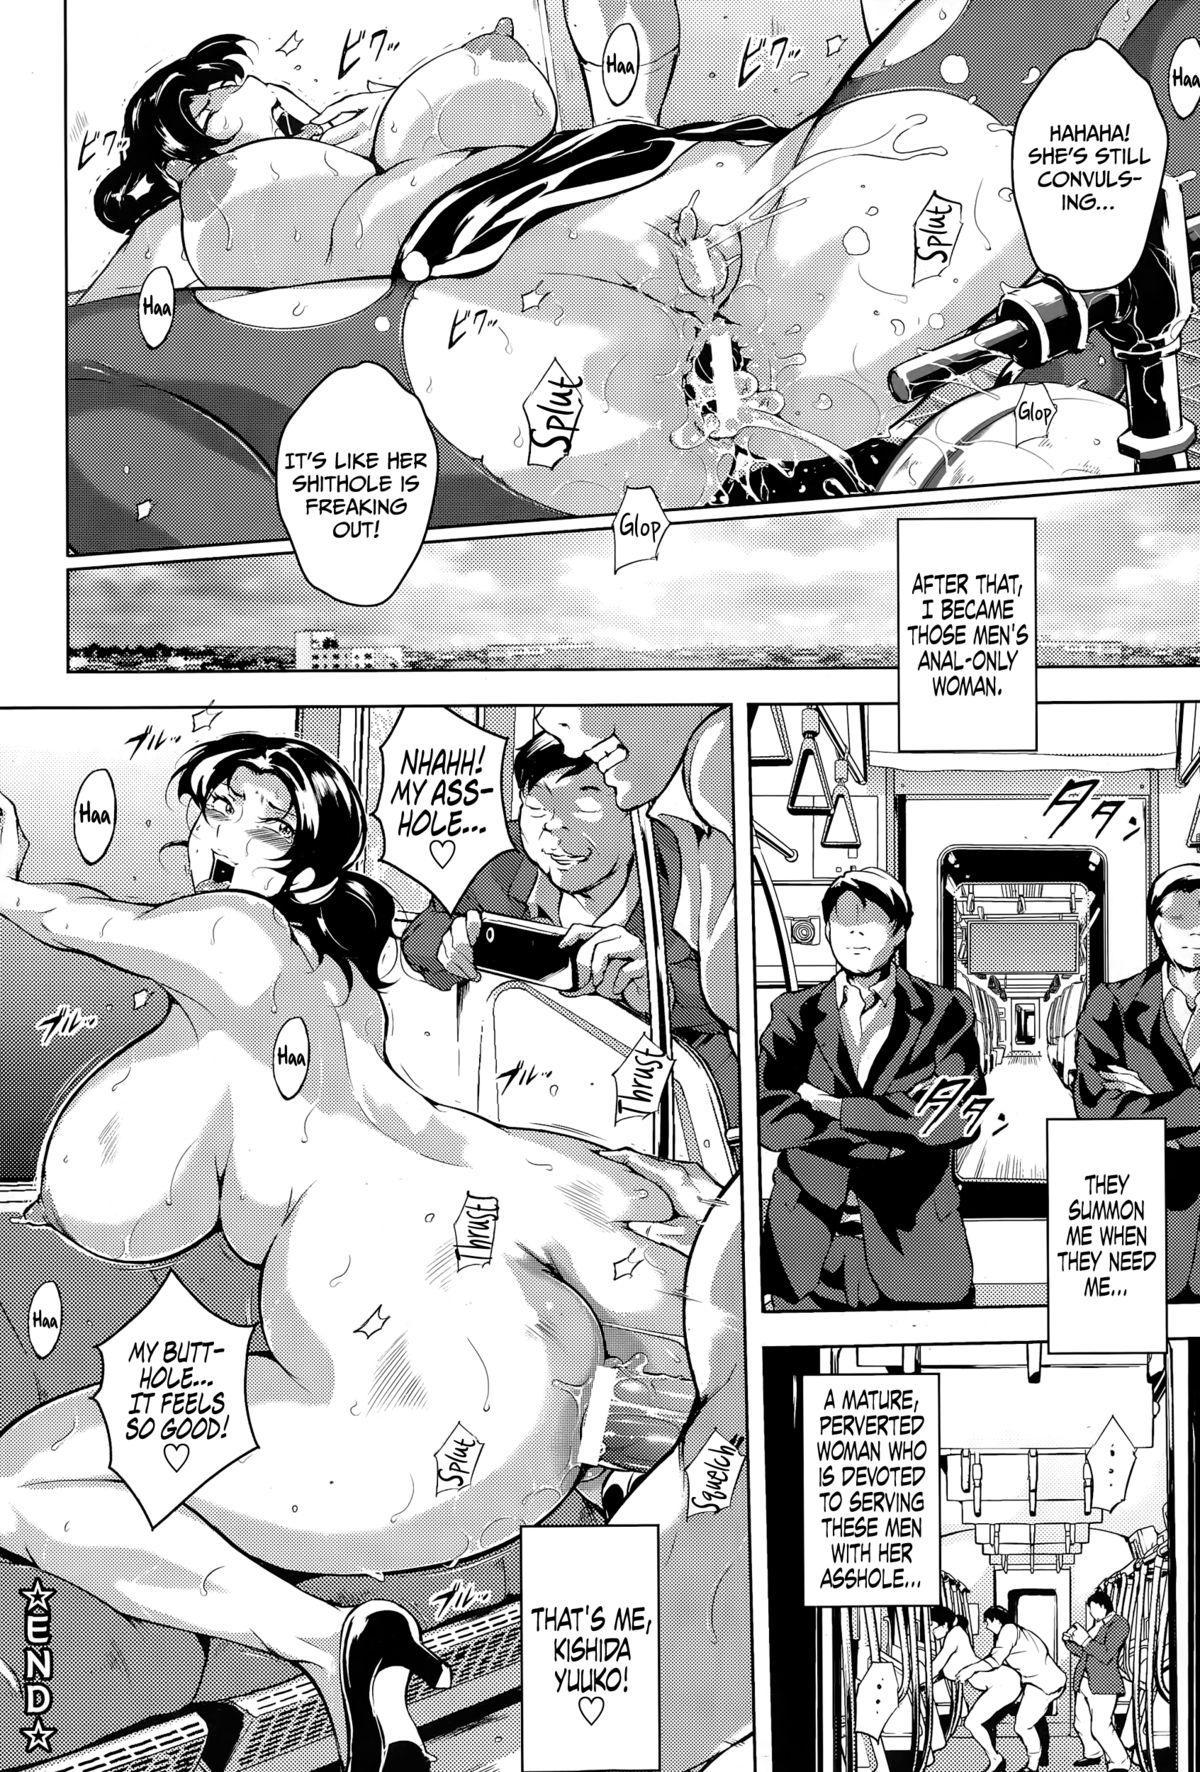 Ryoujyoku Chikan Kyuukou | Rapist Molester Express 17